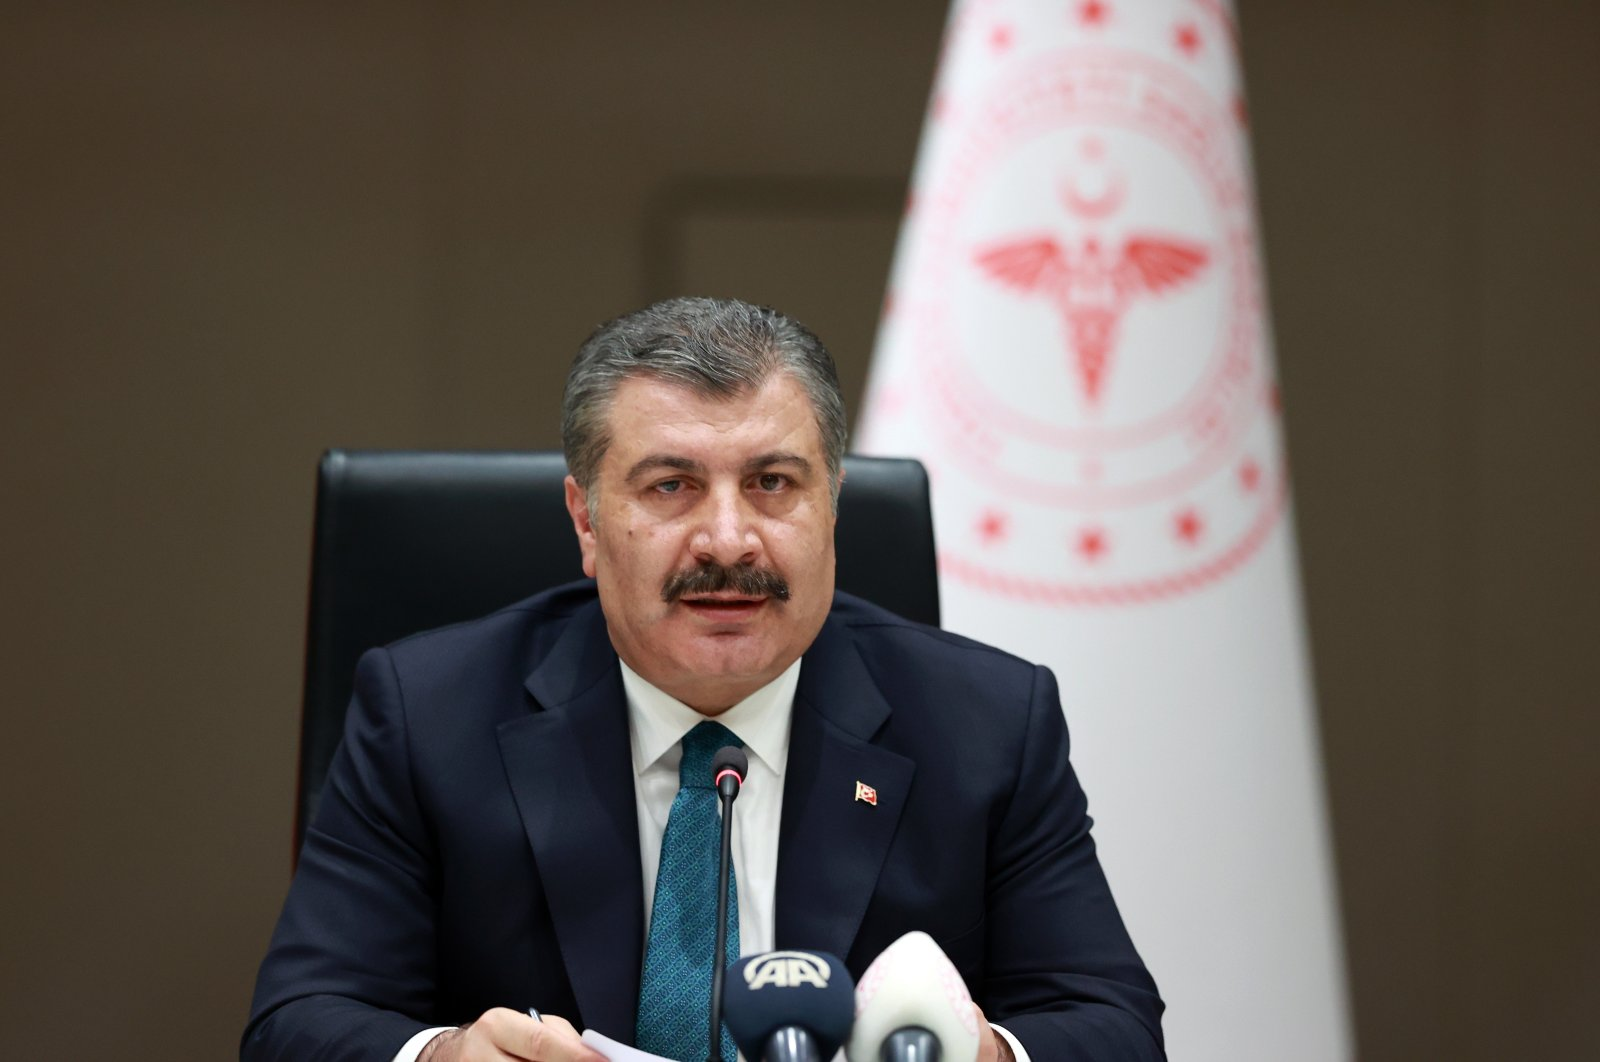 Health Minister Fahrettin Koca speaks at a press conference in Ankara, Turkey, June 23, 2021. (IHA Photo)